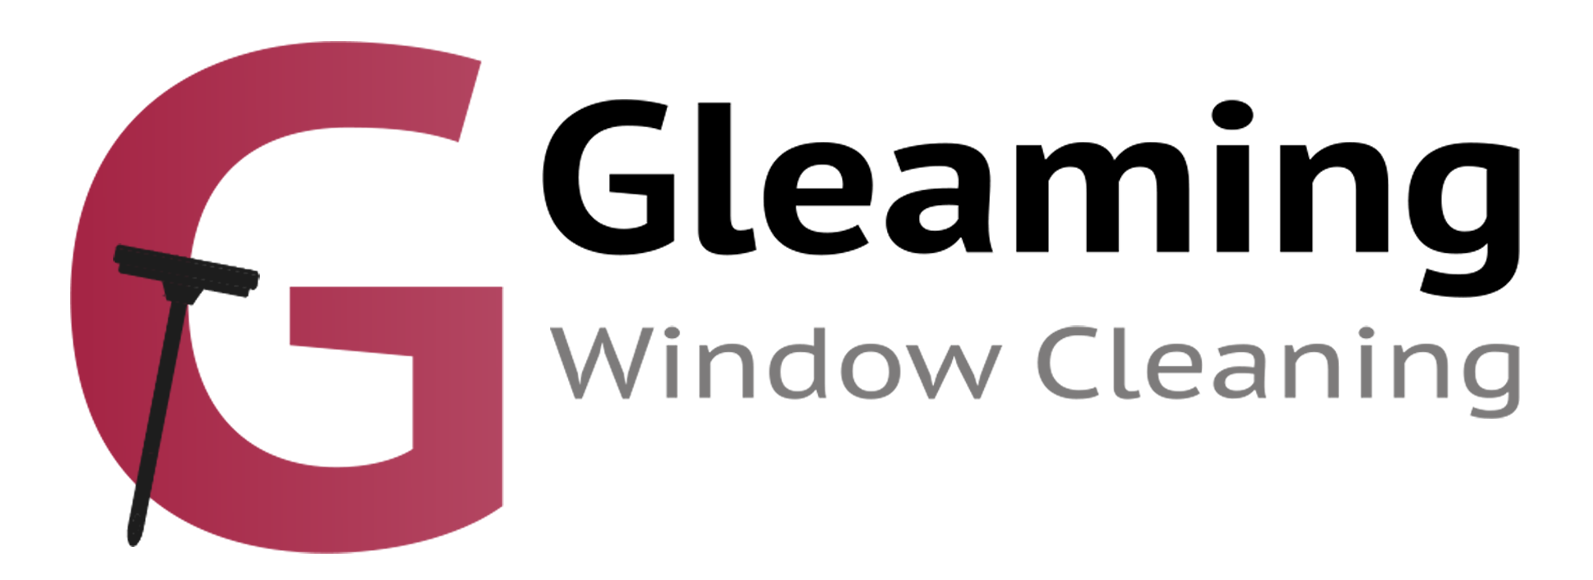 Gleaming Window Cleaning Ltd